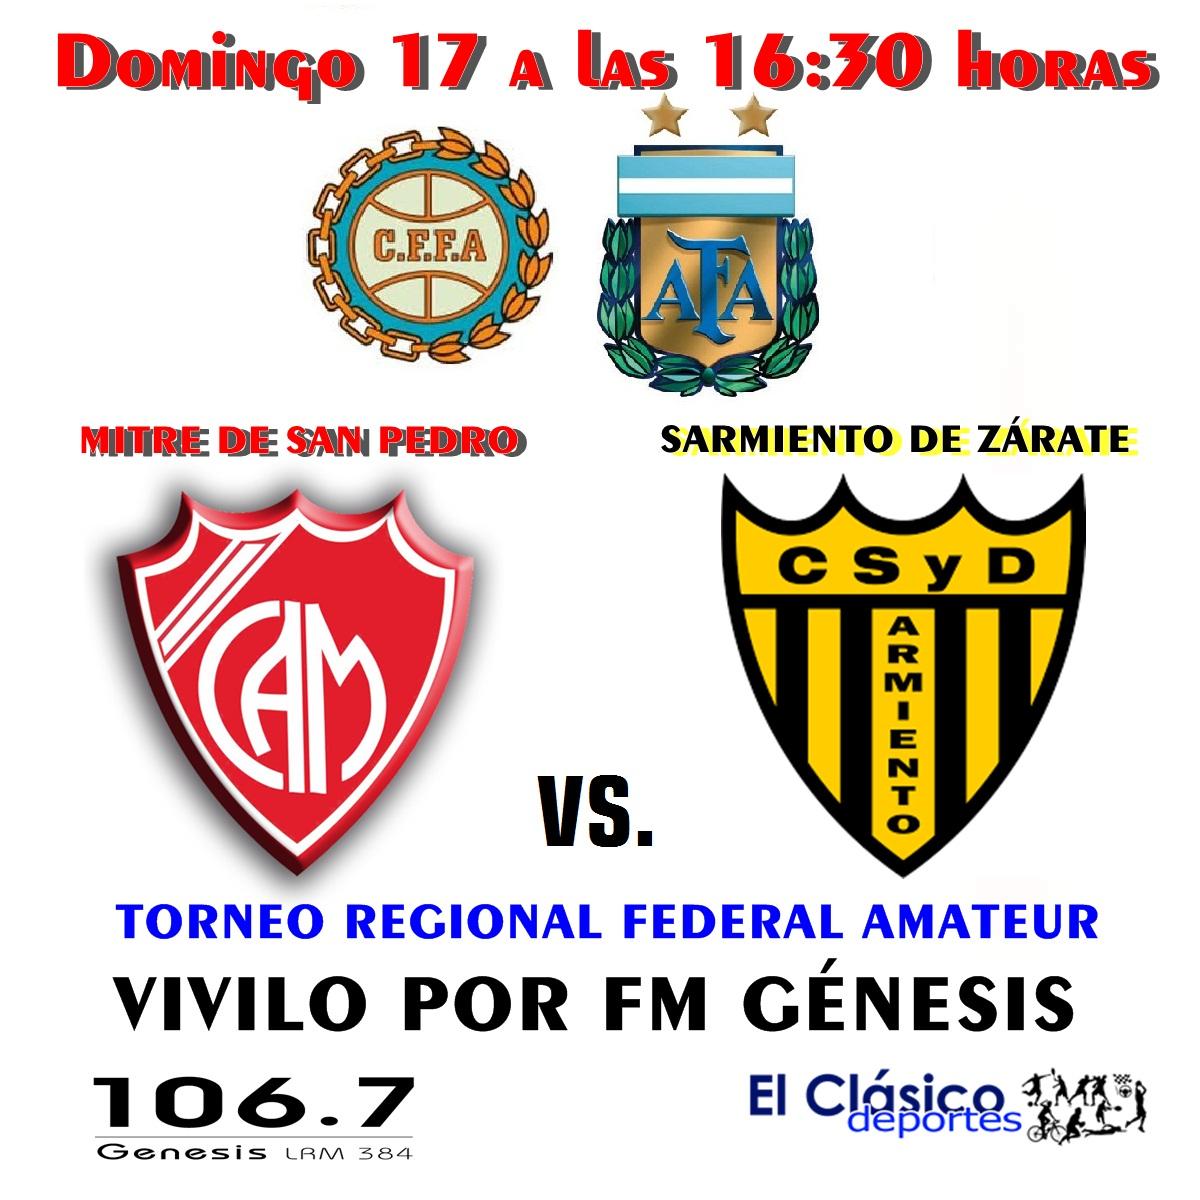 Torneo Regional Federal Amateur: Mitre ante Sarmiento vivilo por FM Génesis